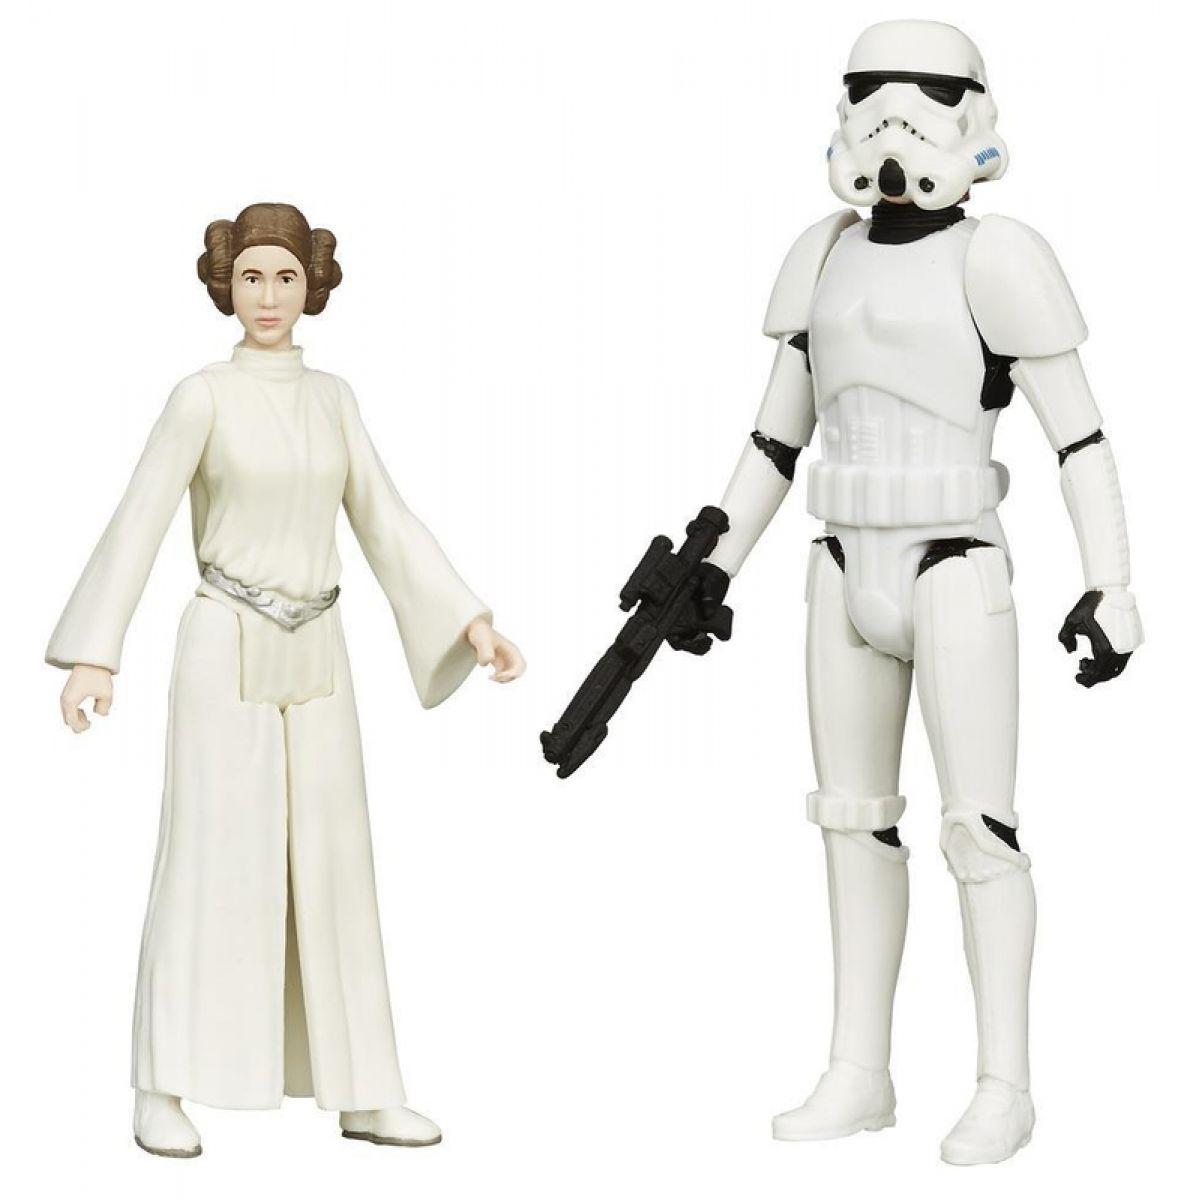 Star Wars akční figurky 2ks Hasbro A5228 - Princess Leia a Luke Skywalker